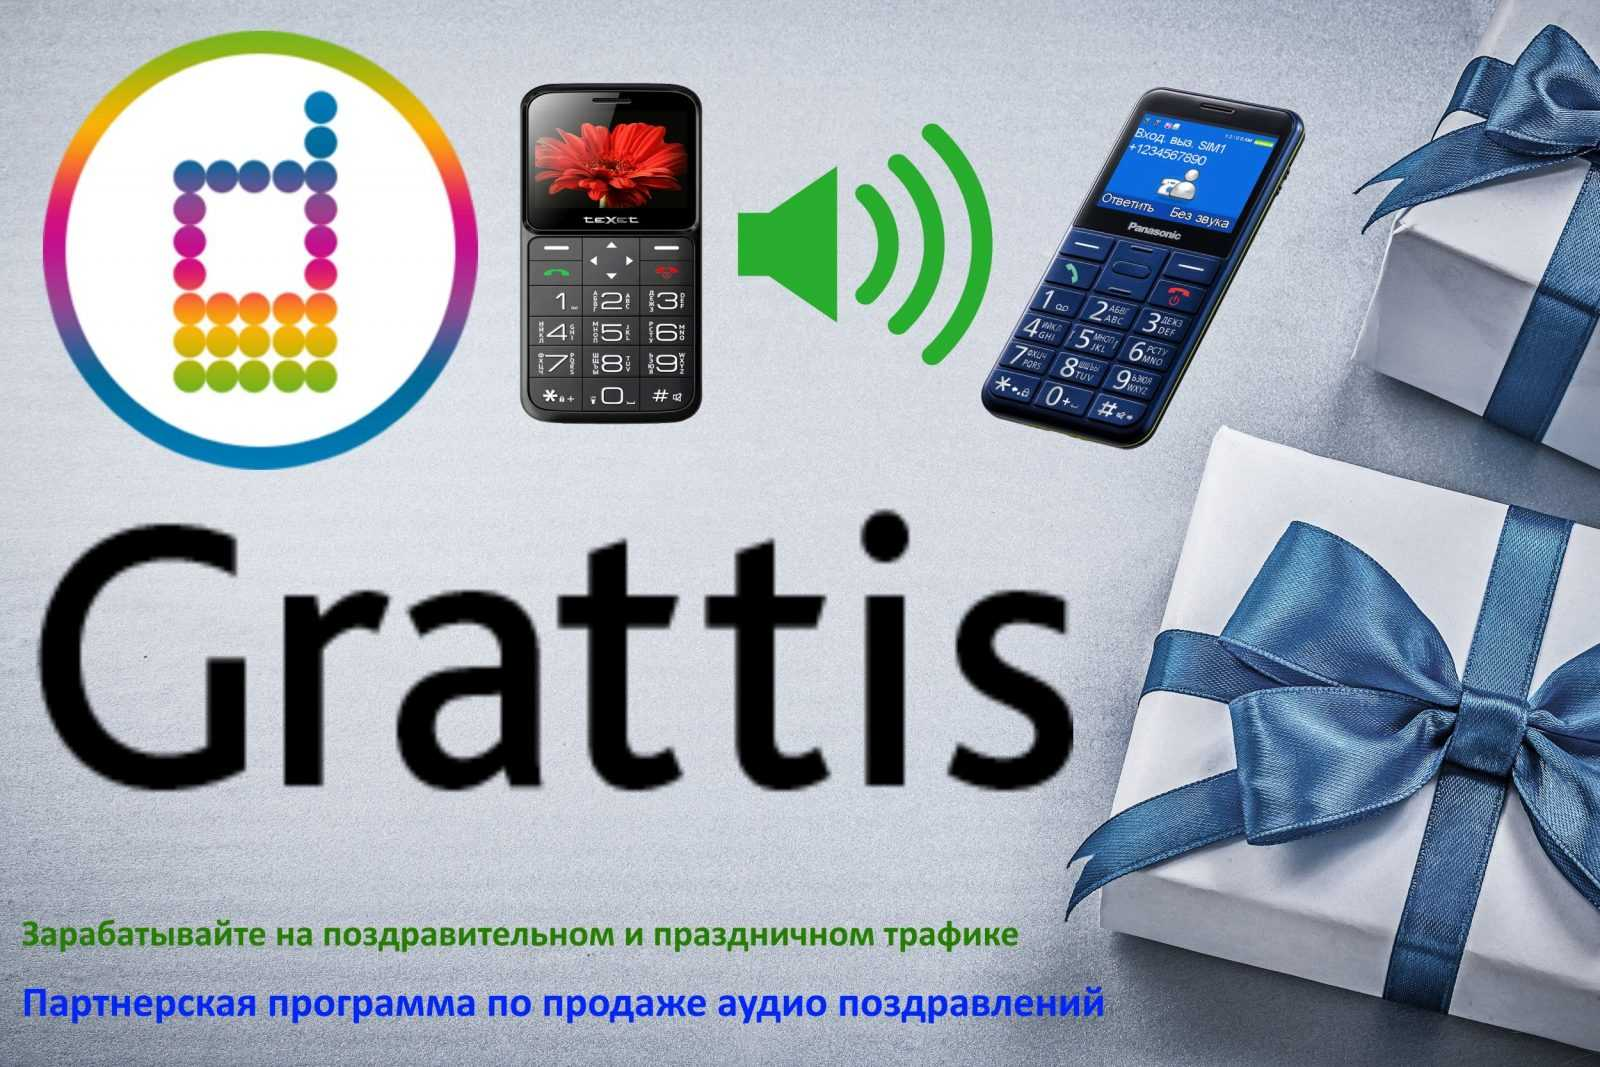 Партнерка Grattis